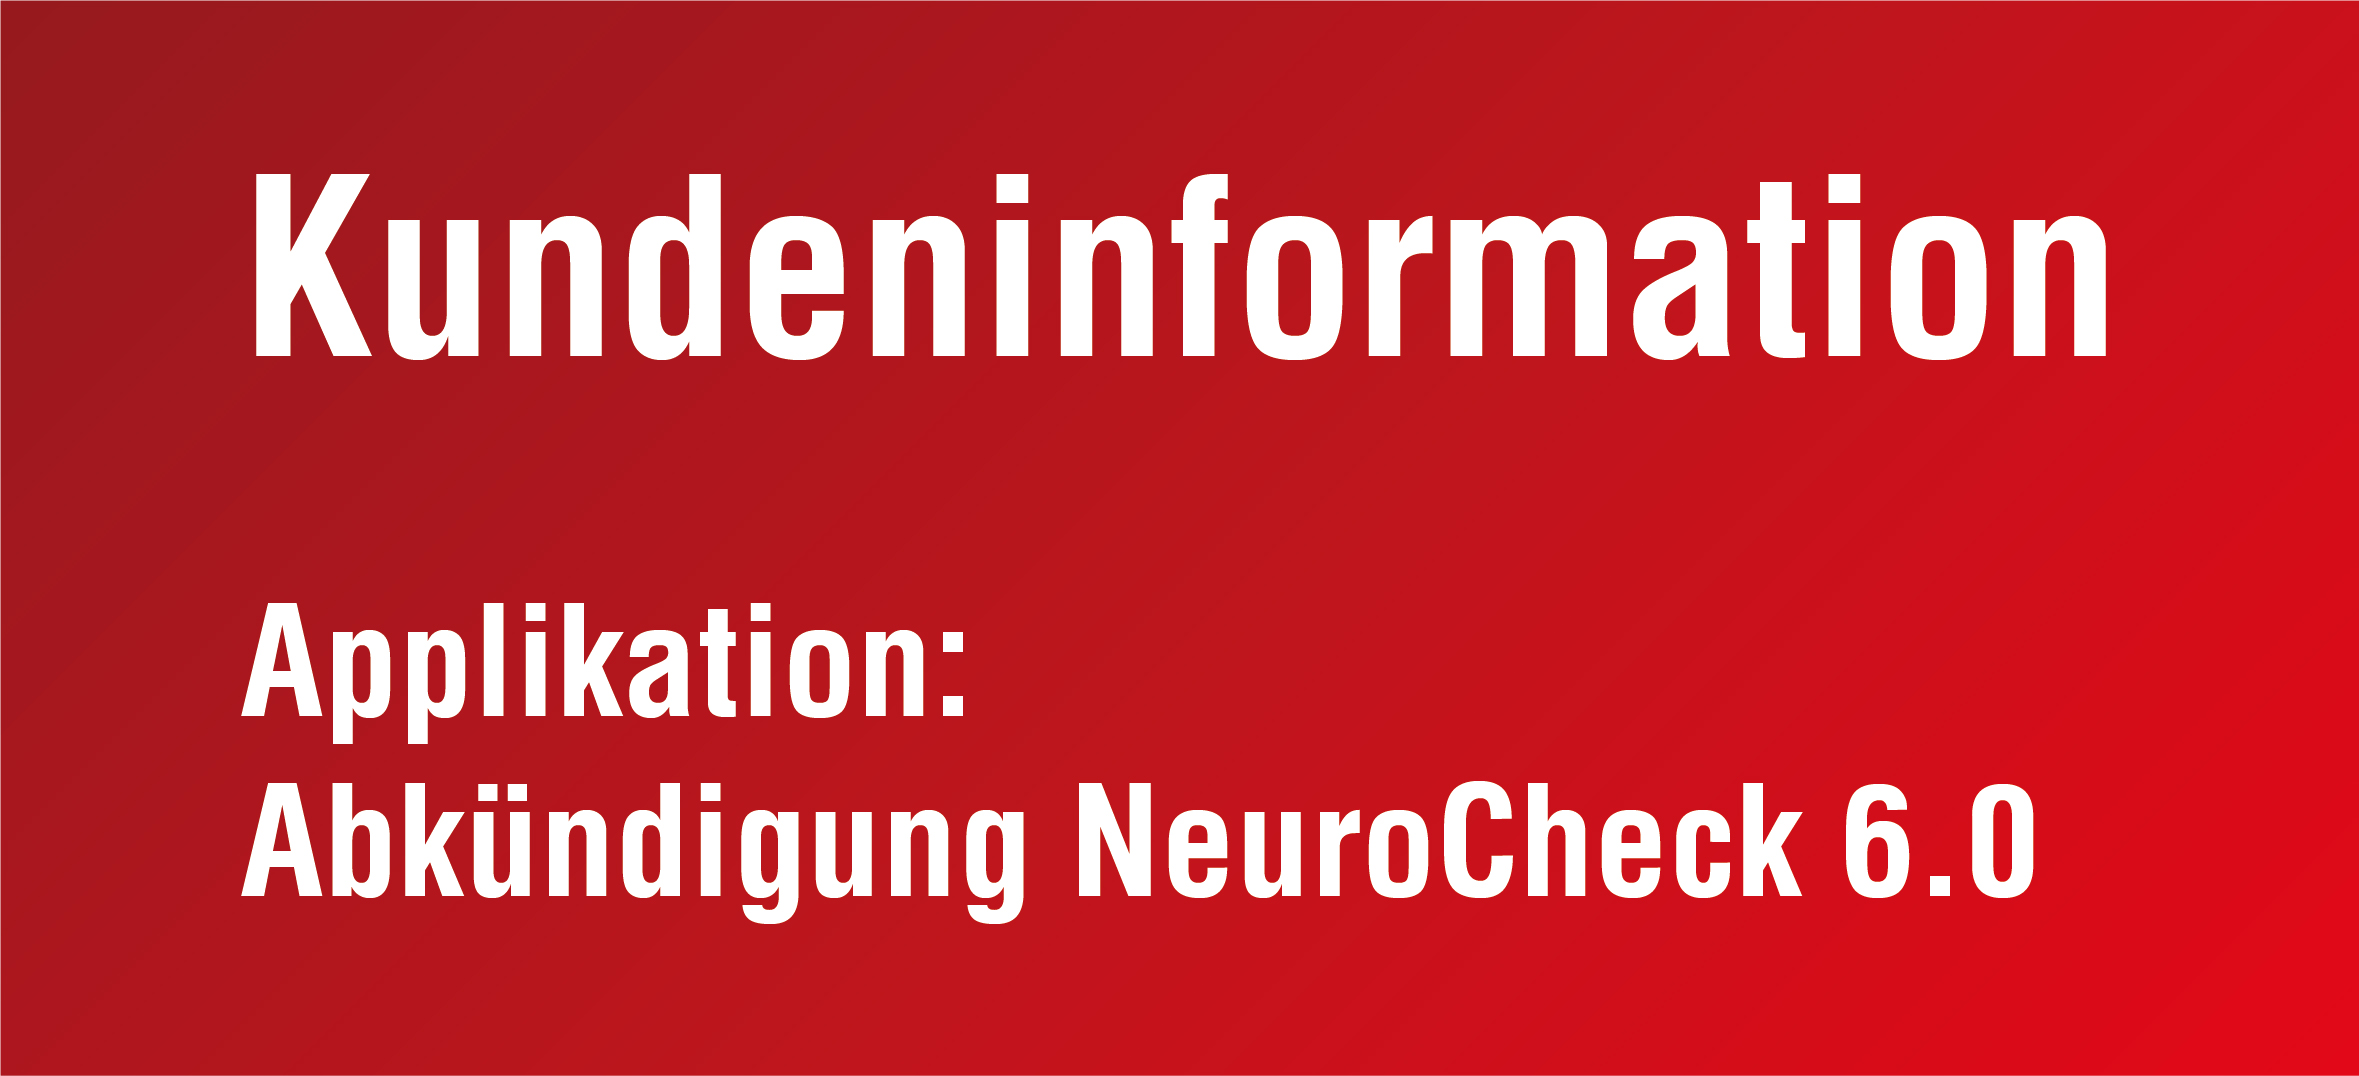 NeuroCheck - Kundeninformation Abkündigung NeuroCheck 6.0 (Foto © NeuroCheck)